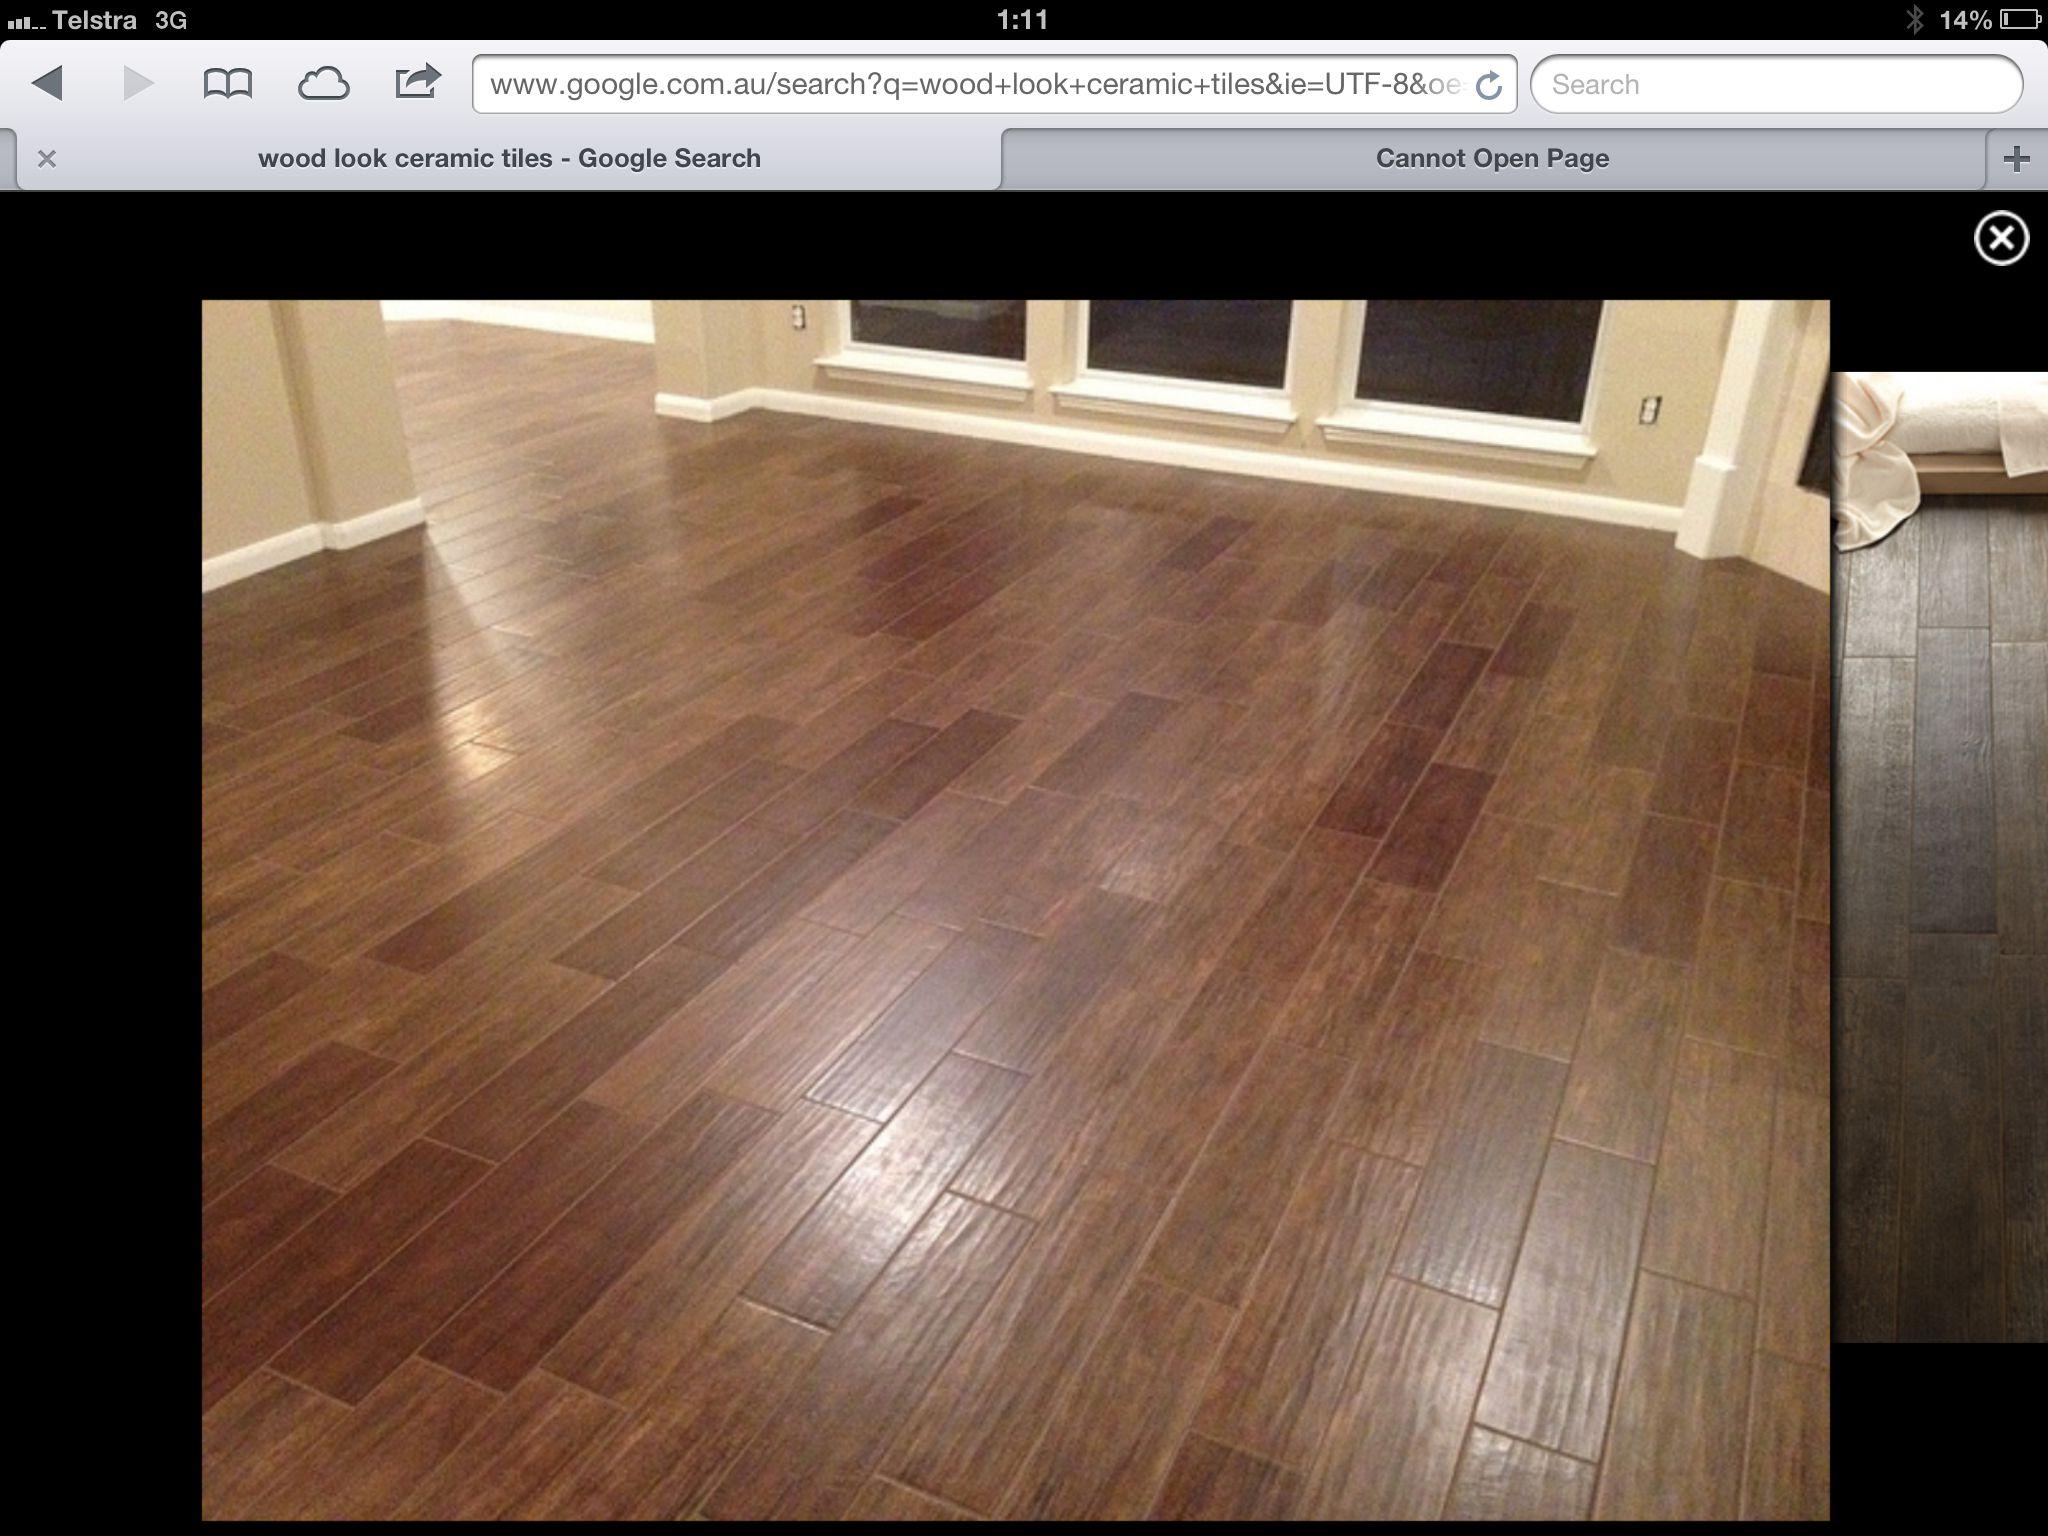 Wood look ceramic floor tiles | tile samples | Pinterest | Ceramic ...